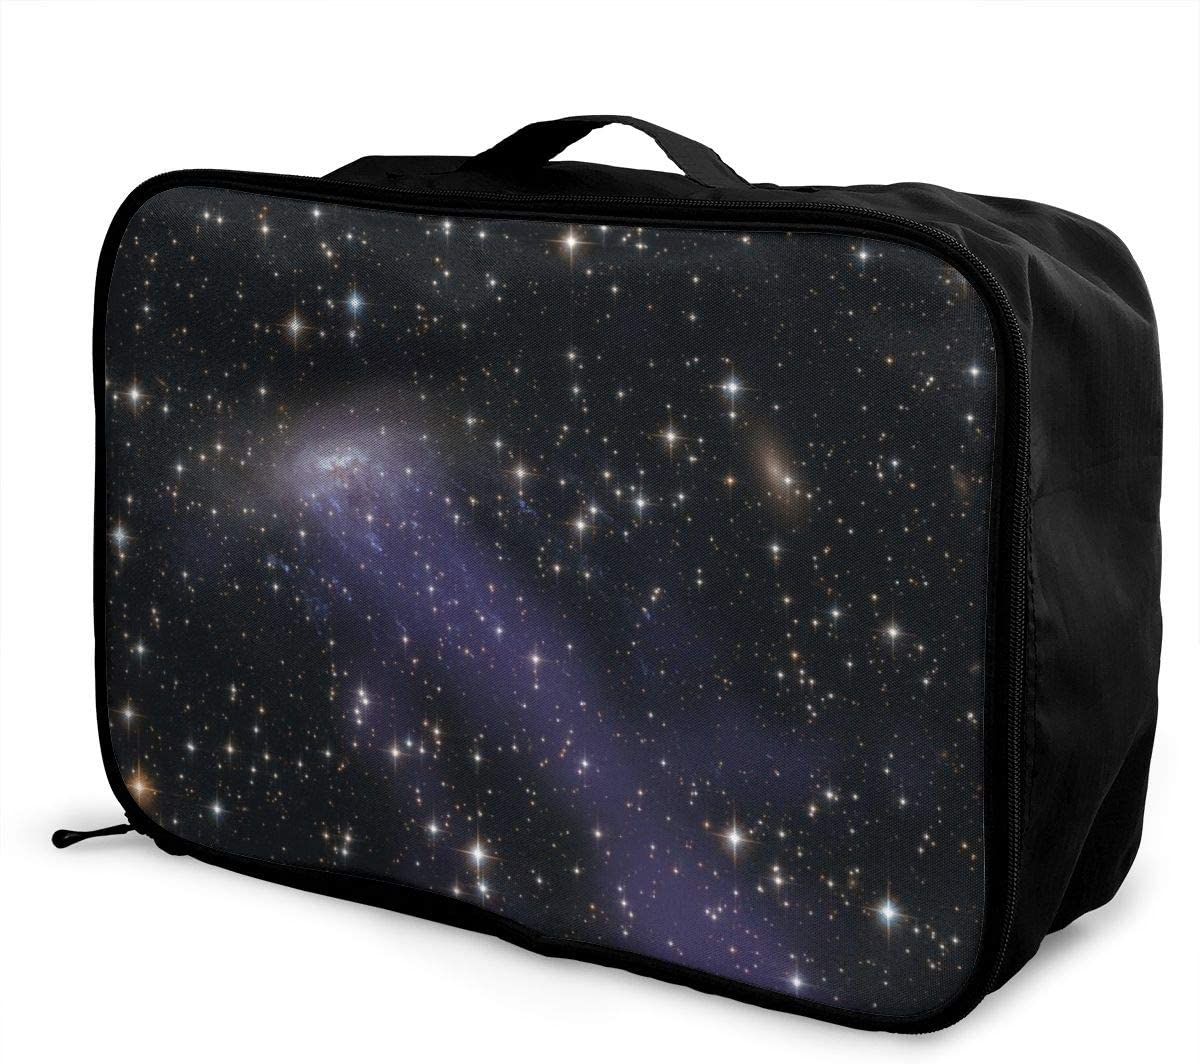 Yunshm Galaxy Gas Stream Constellations Stars Hubble Personalized Trolley Handbag Waterproof Unisex Large Capacity For Business Travel Storage